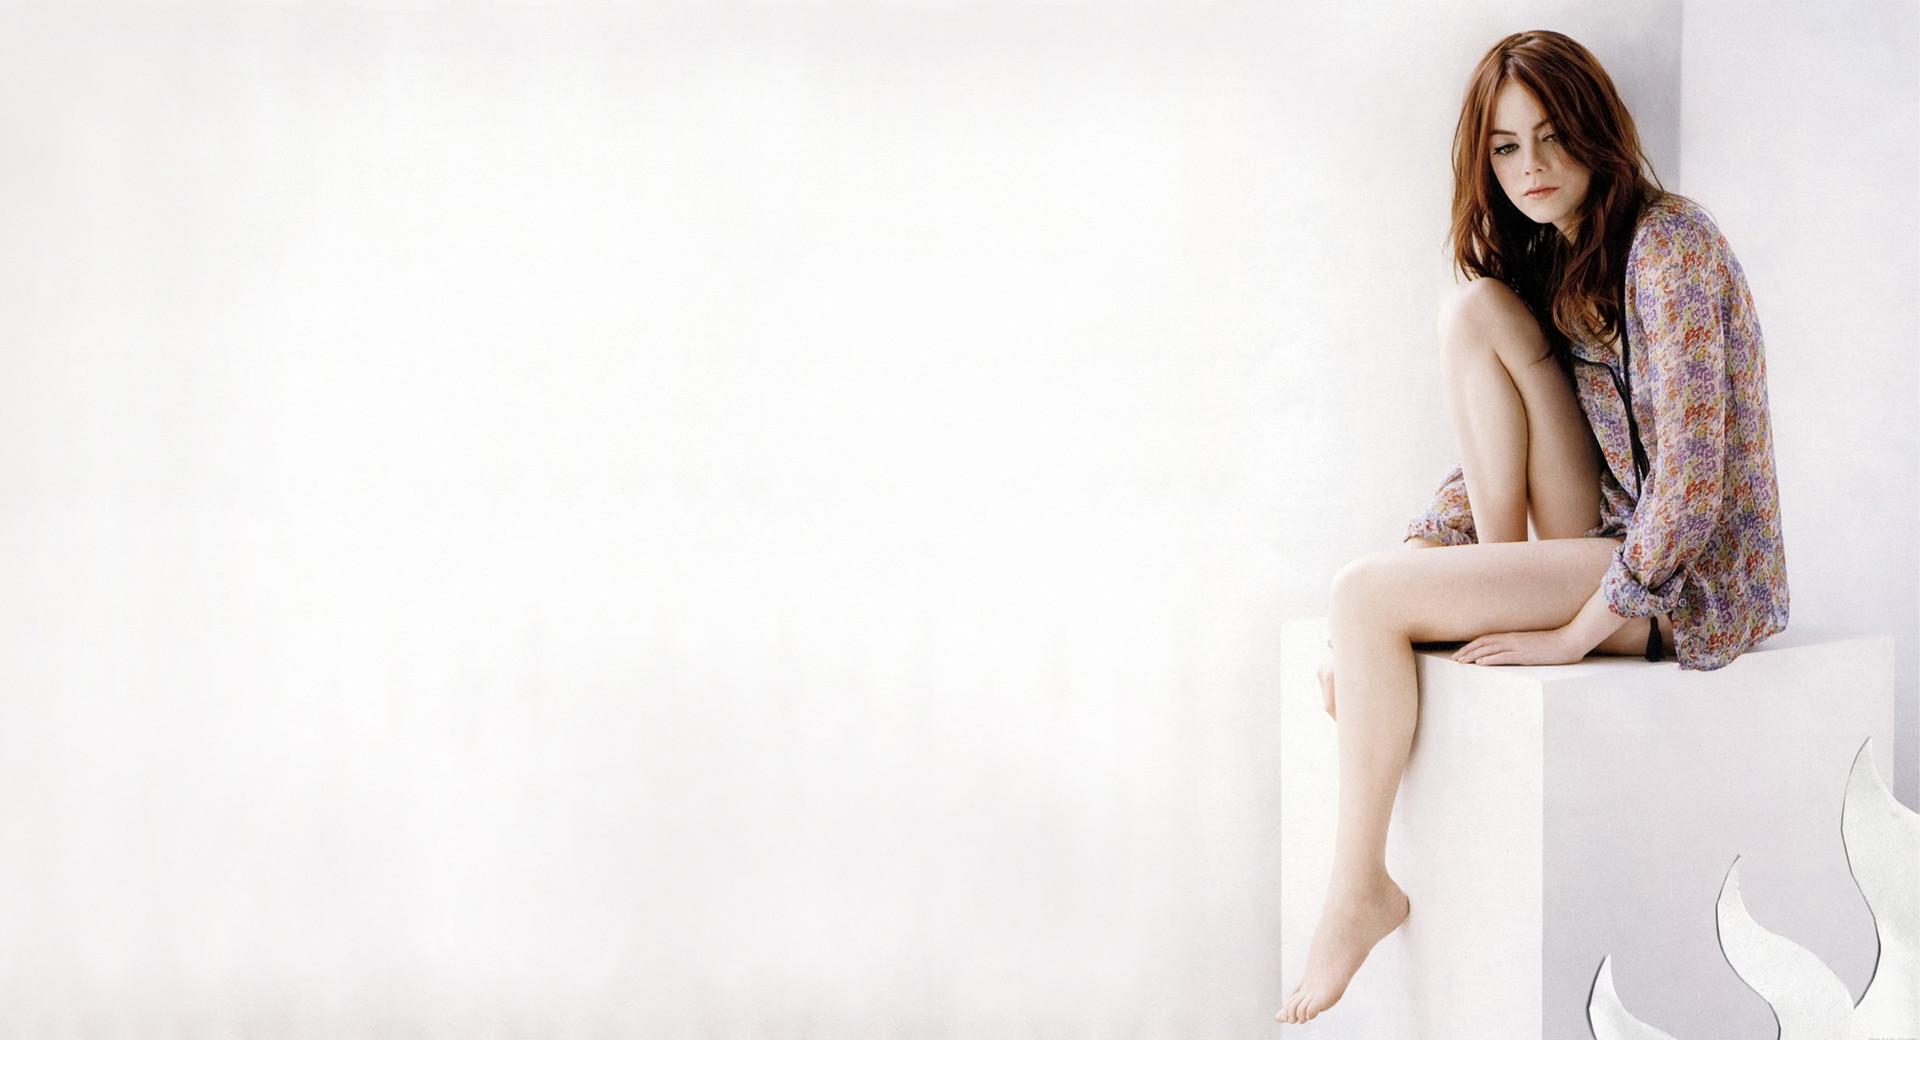 Emma Stone Computer Wallpapers, Desktop Backgrounds | | ID .